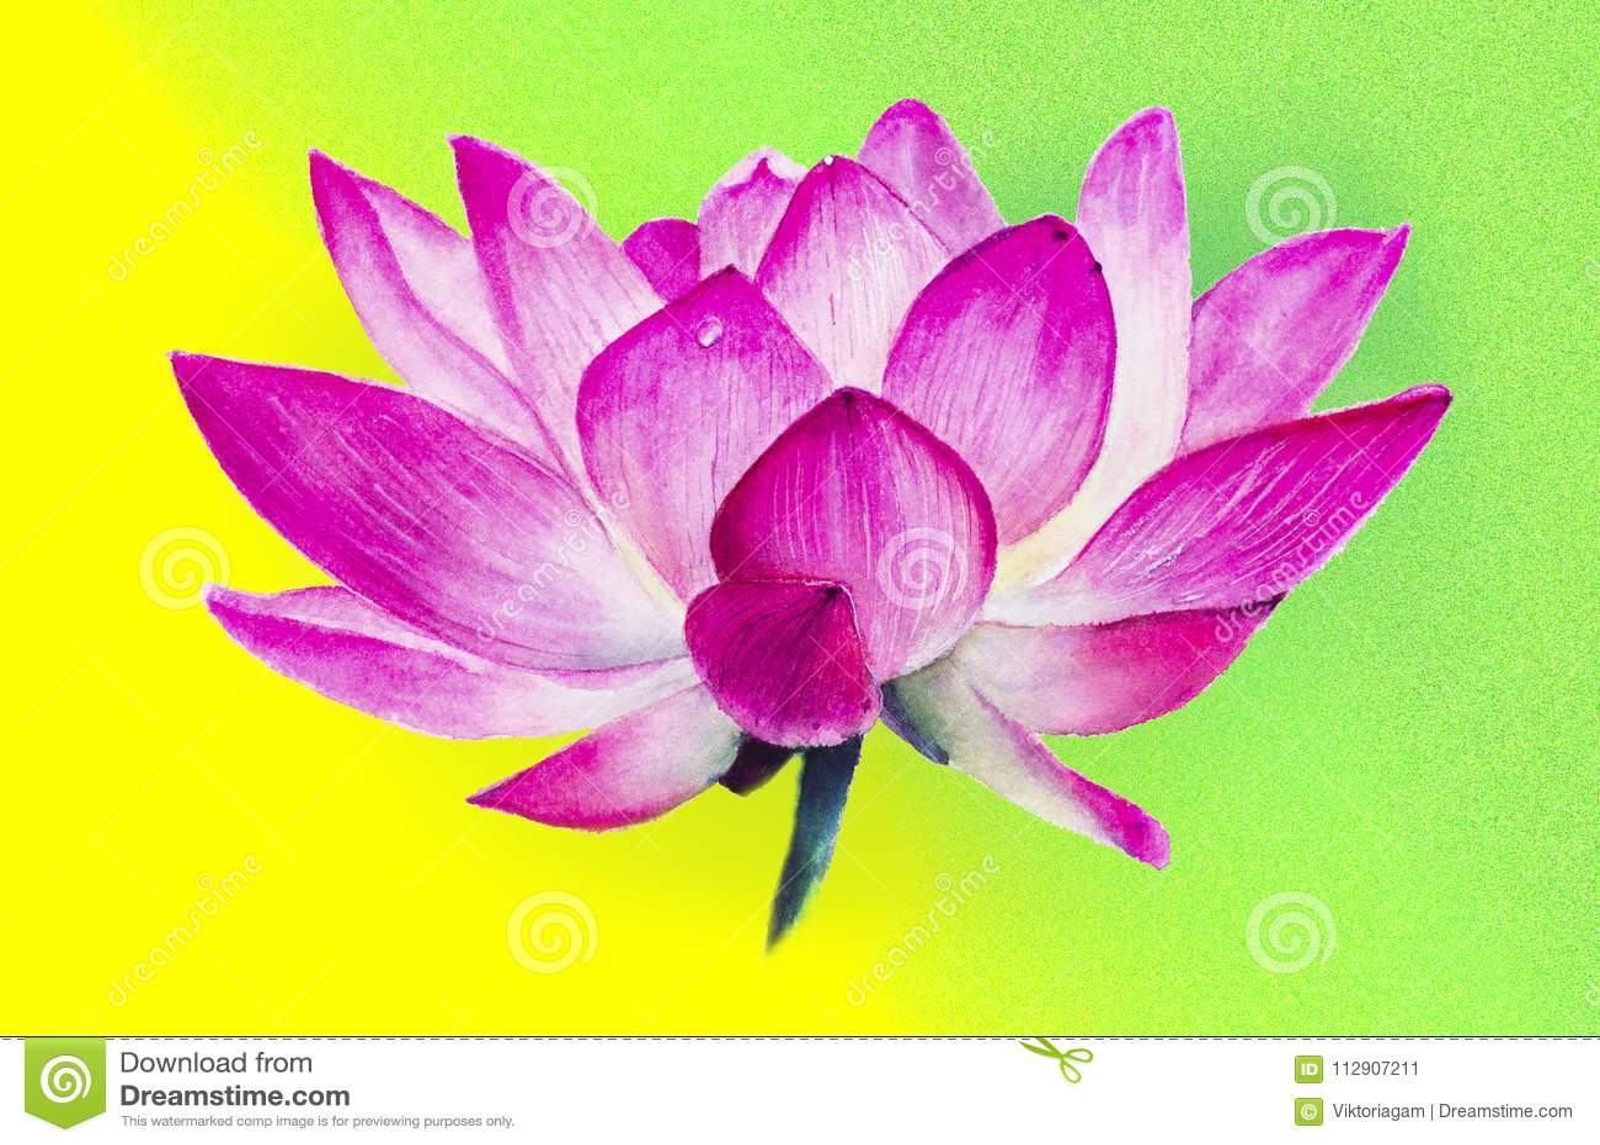 Lotus Flower Macro Close Up Side View Watercolor Drawing Re